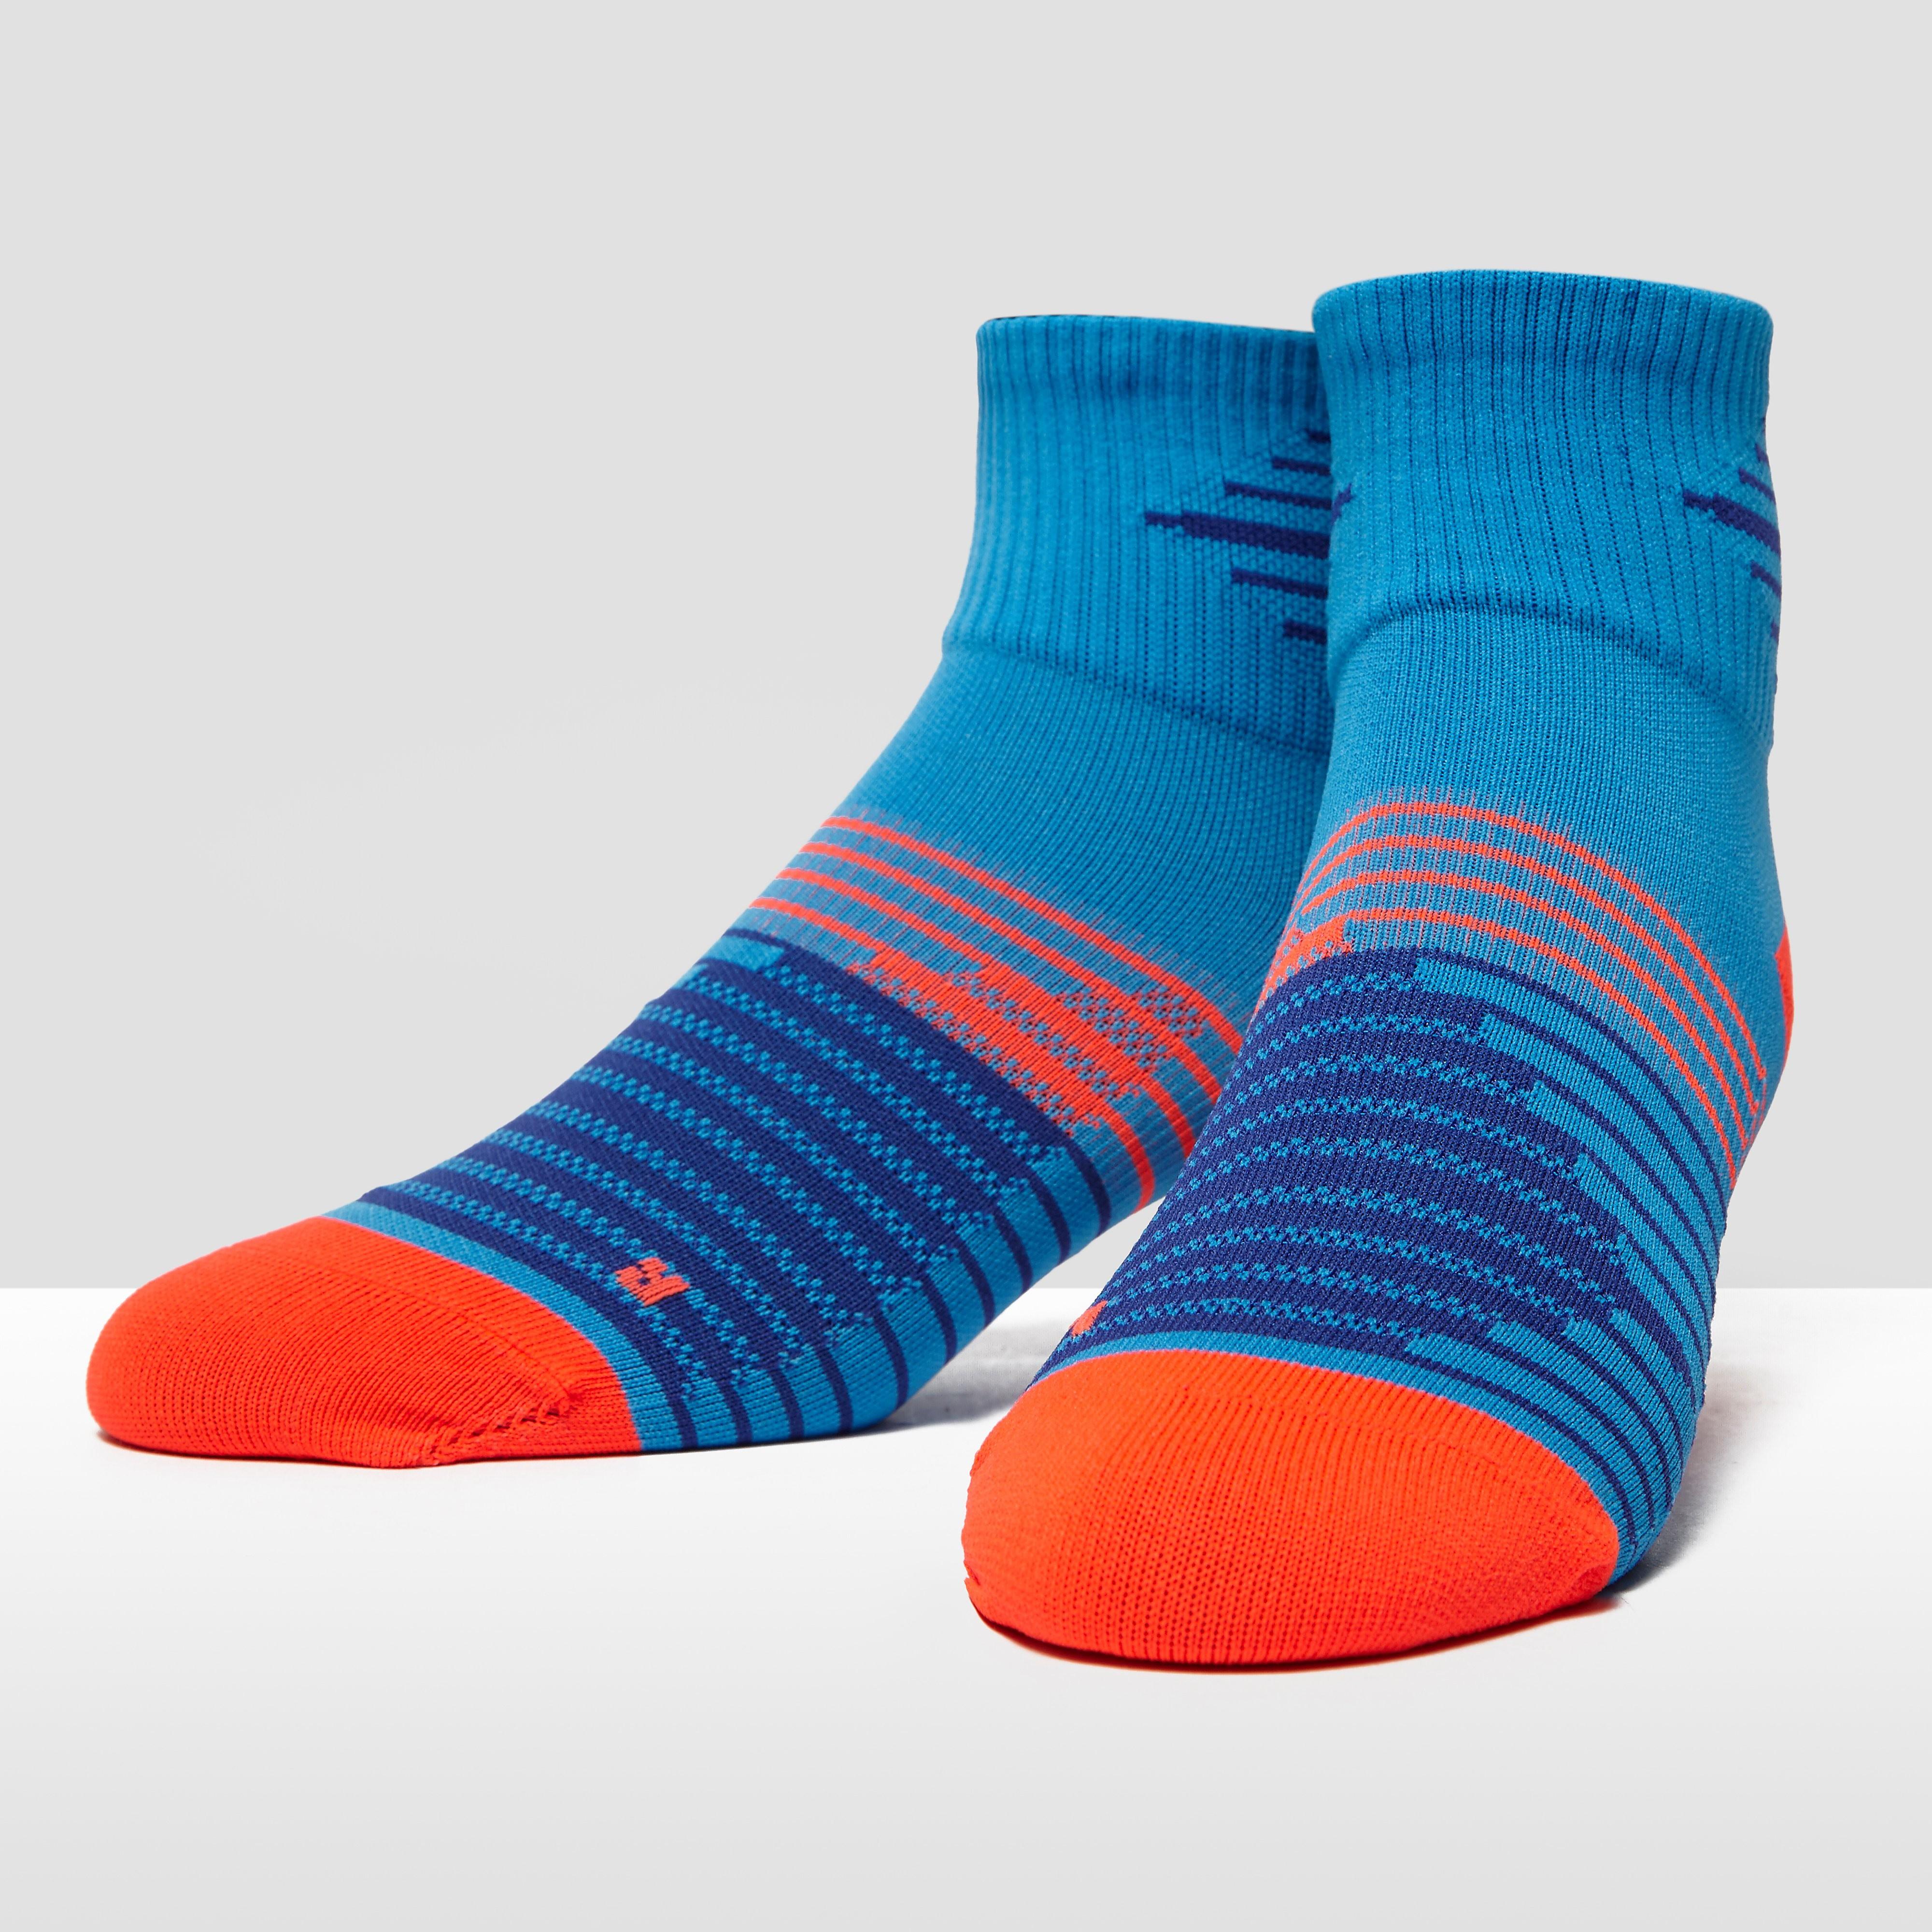 Nike Dri-FIT Lightweight Quarter Running Socks